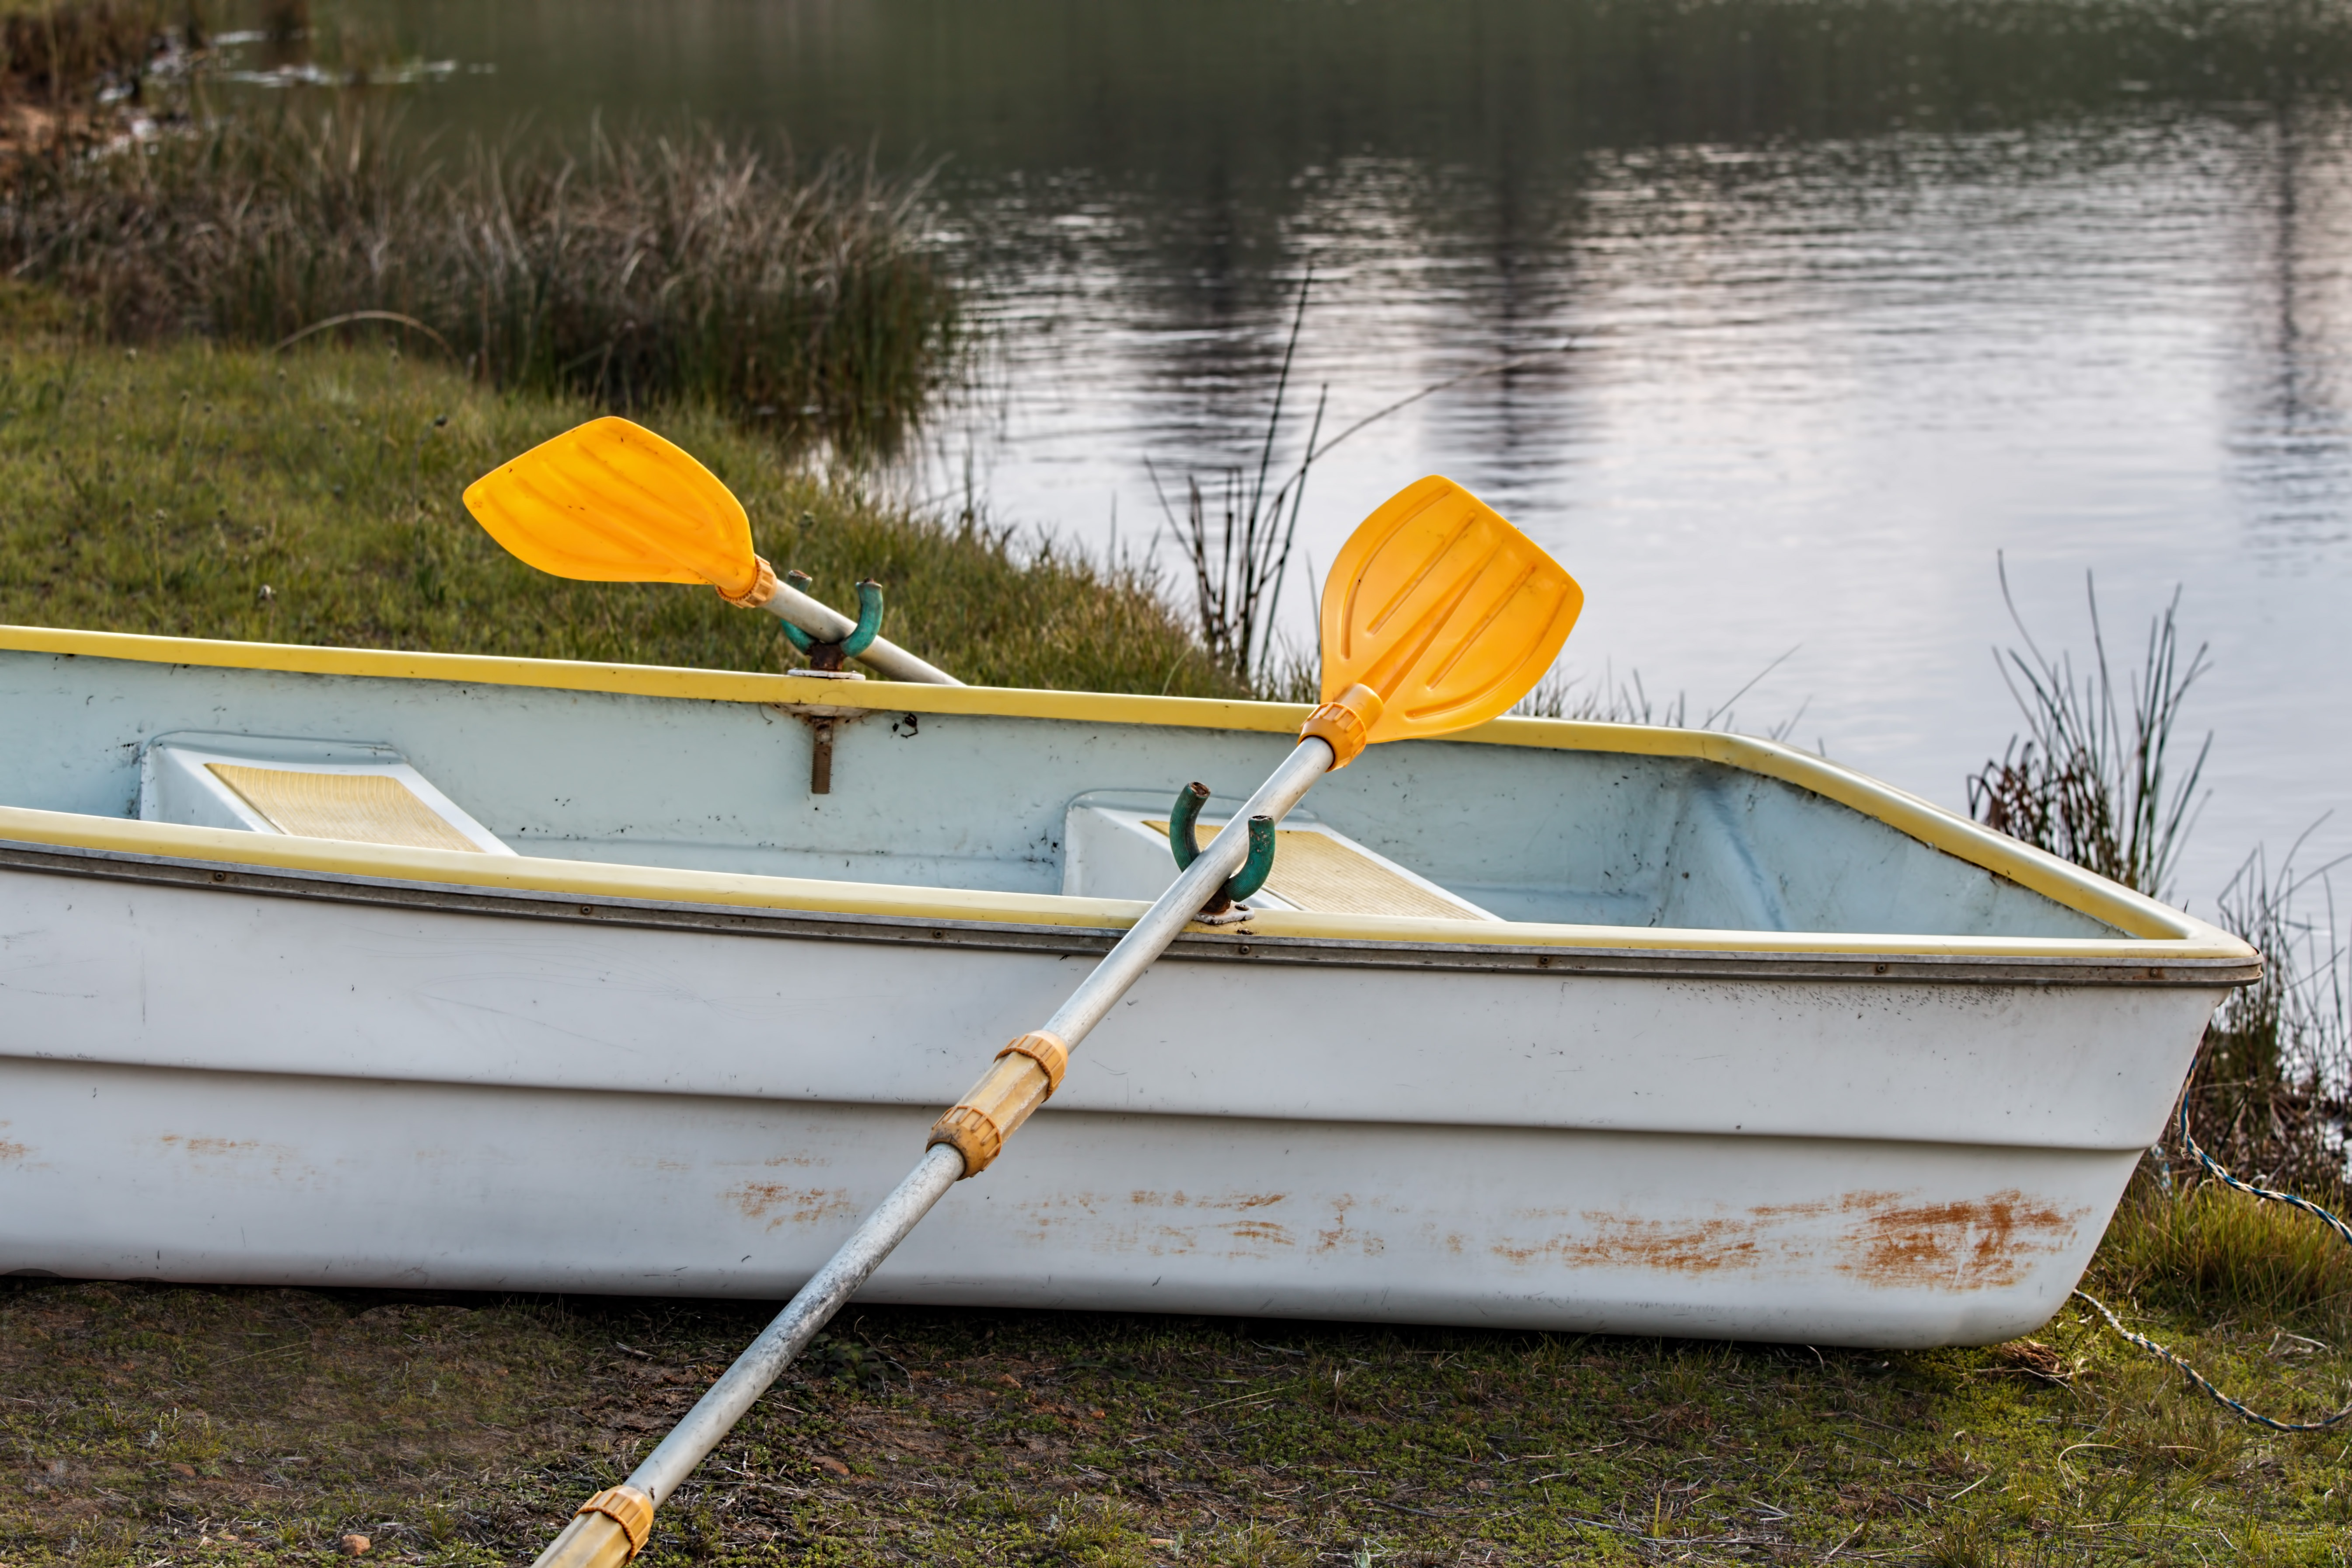 Boat, Lake, River, Row, Rowing, HQ Photo